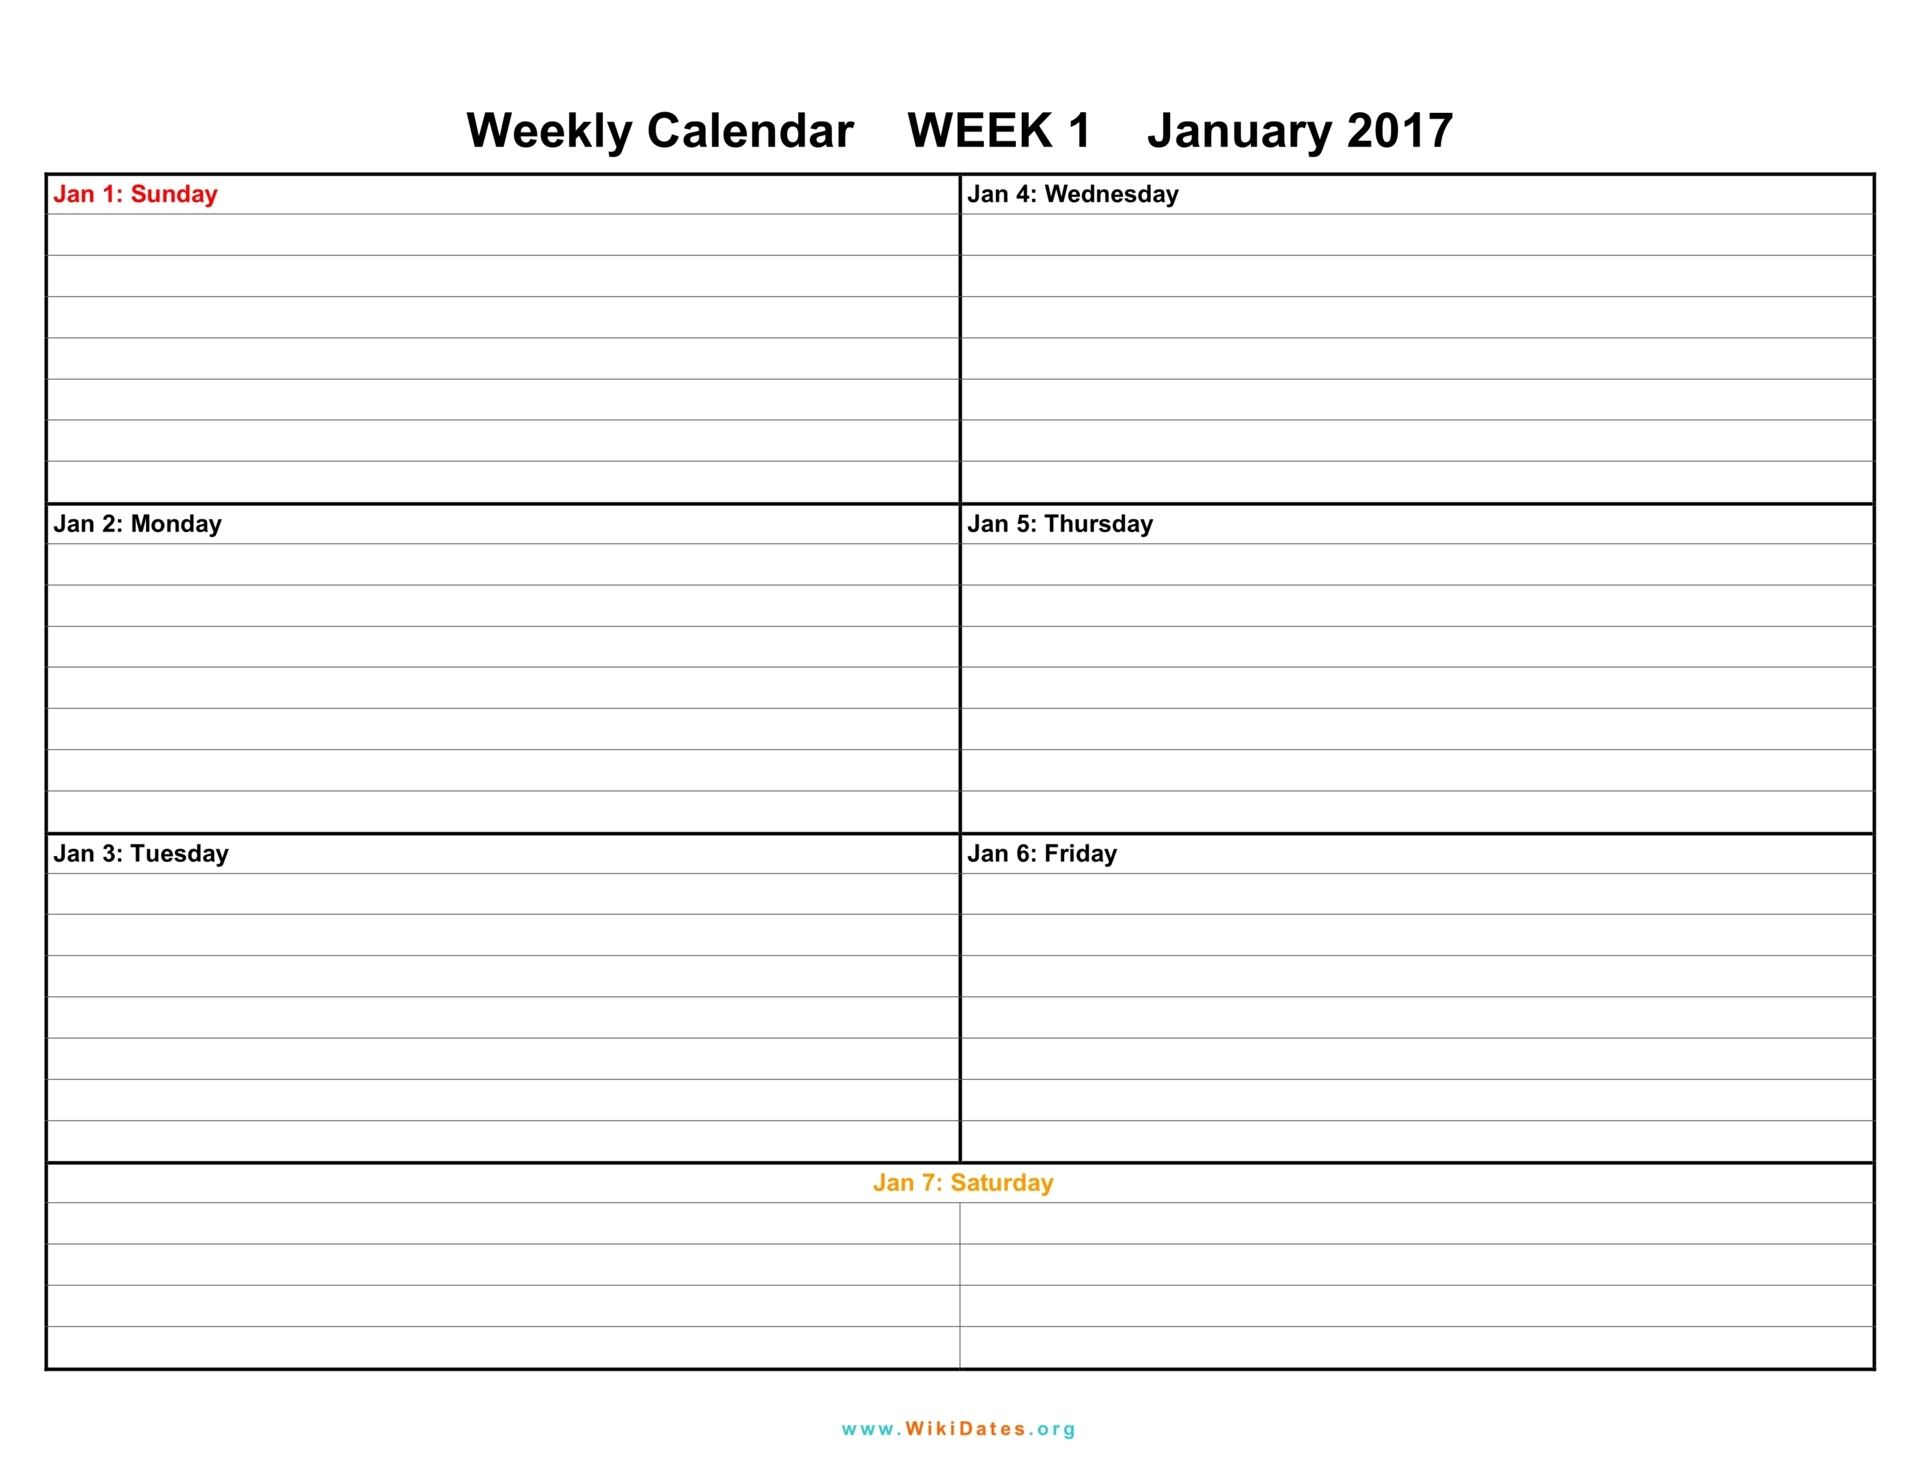 Calendar Agenda Template Word – Word Template Weekly Calendar